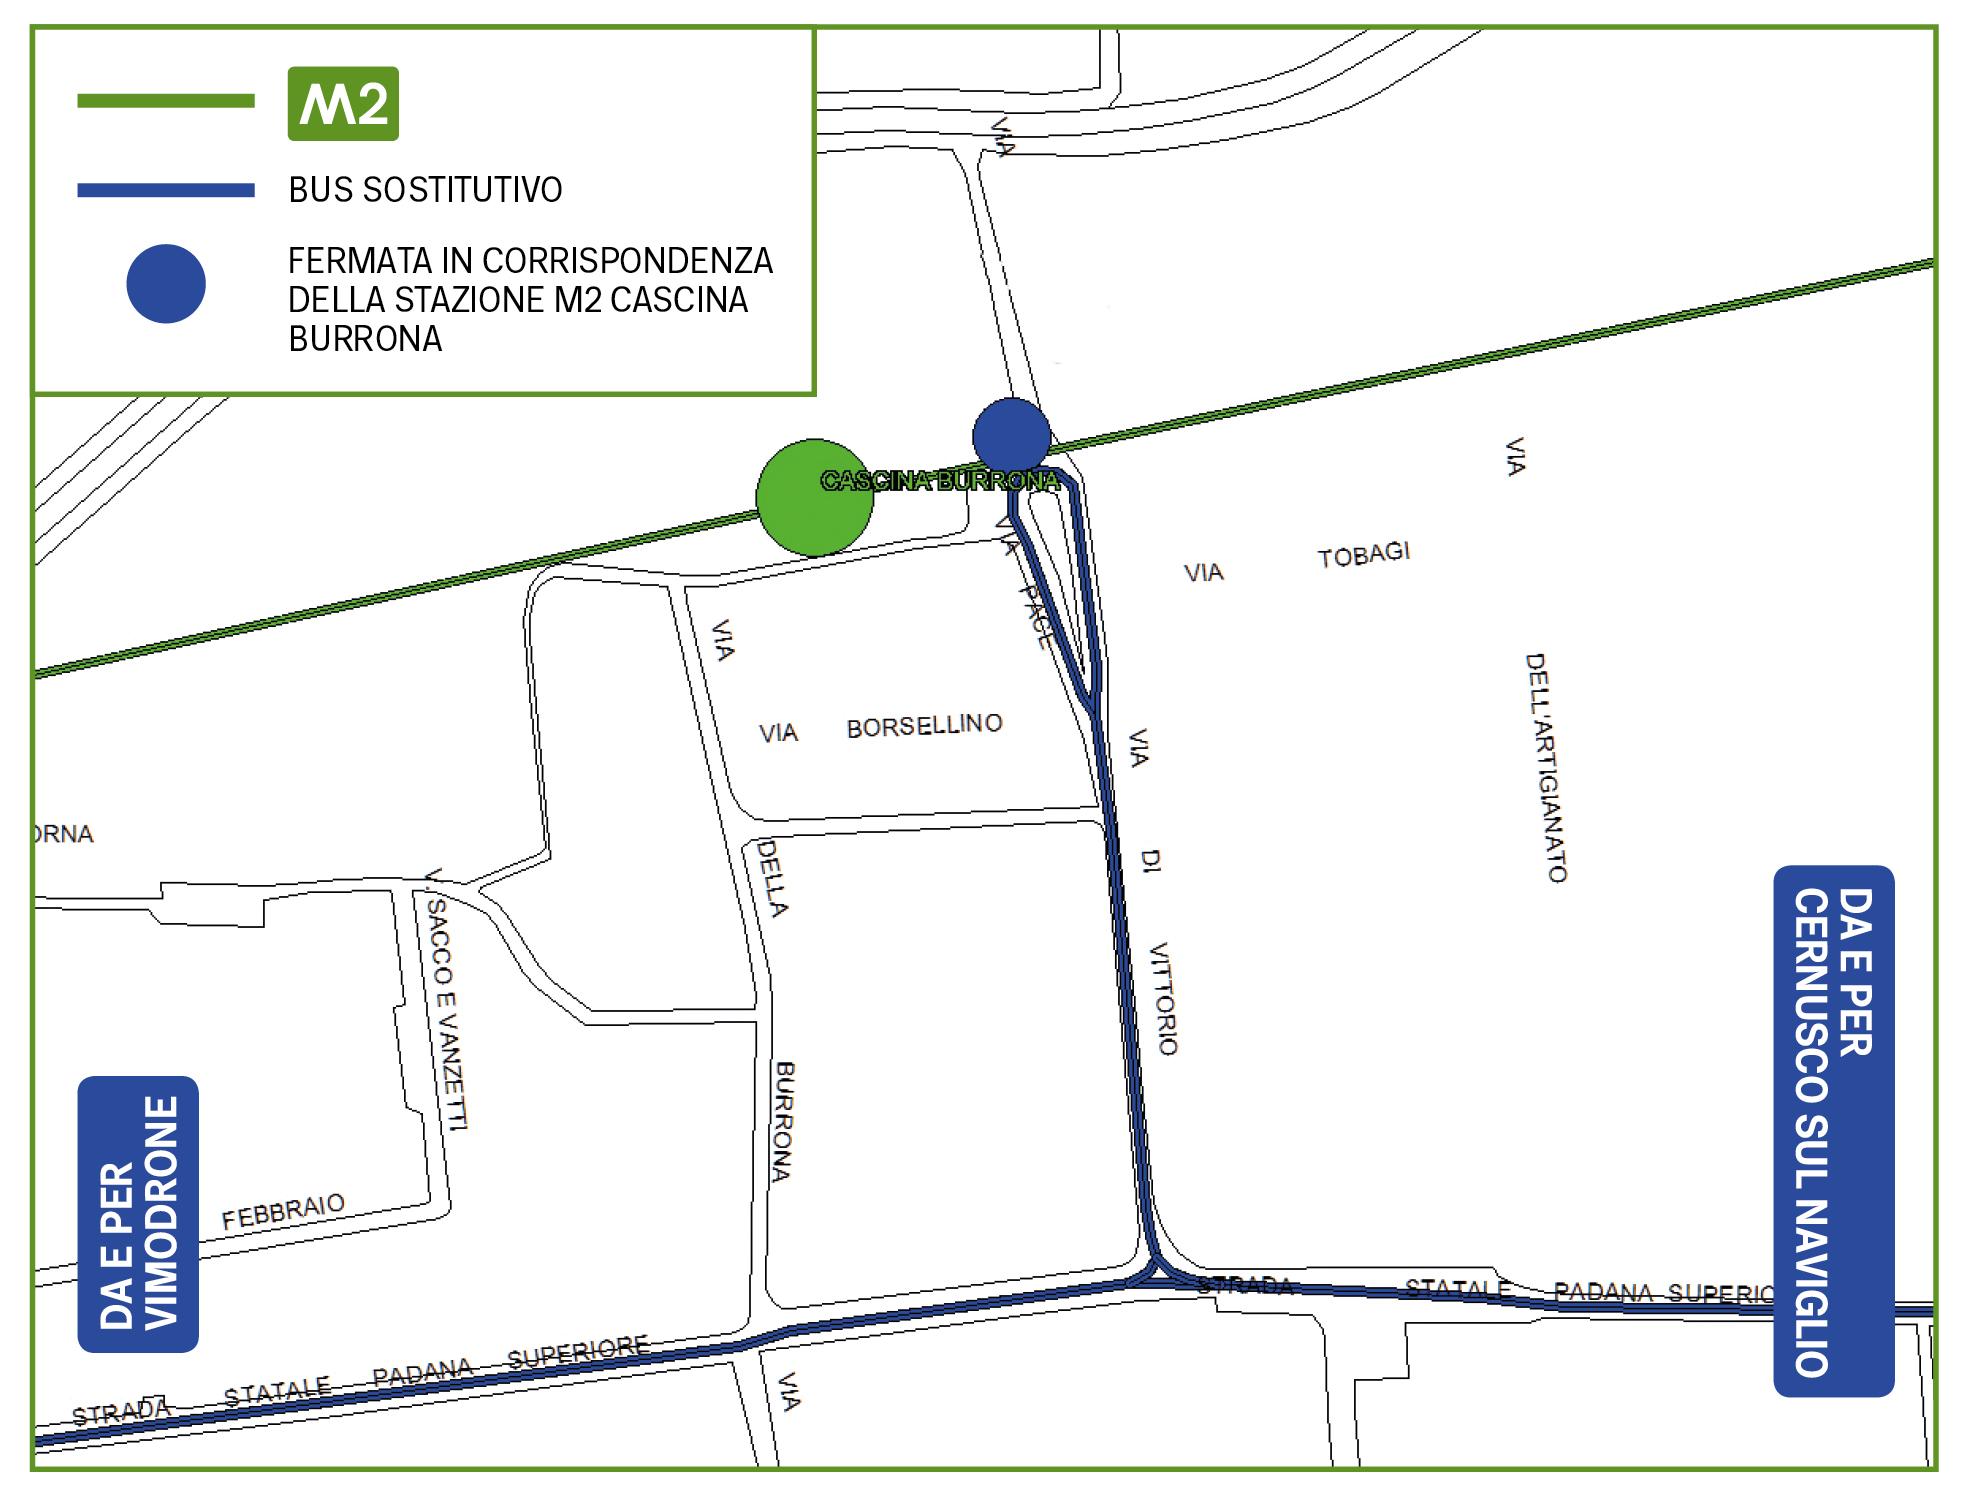 Mappa Bus sostitutivo Cascina Burrona